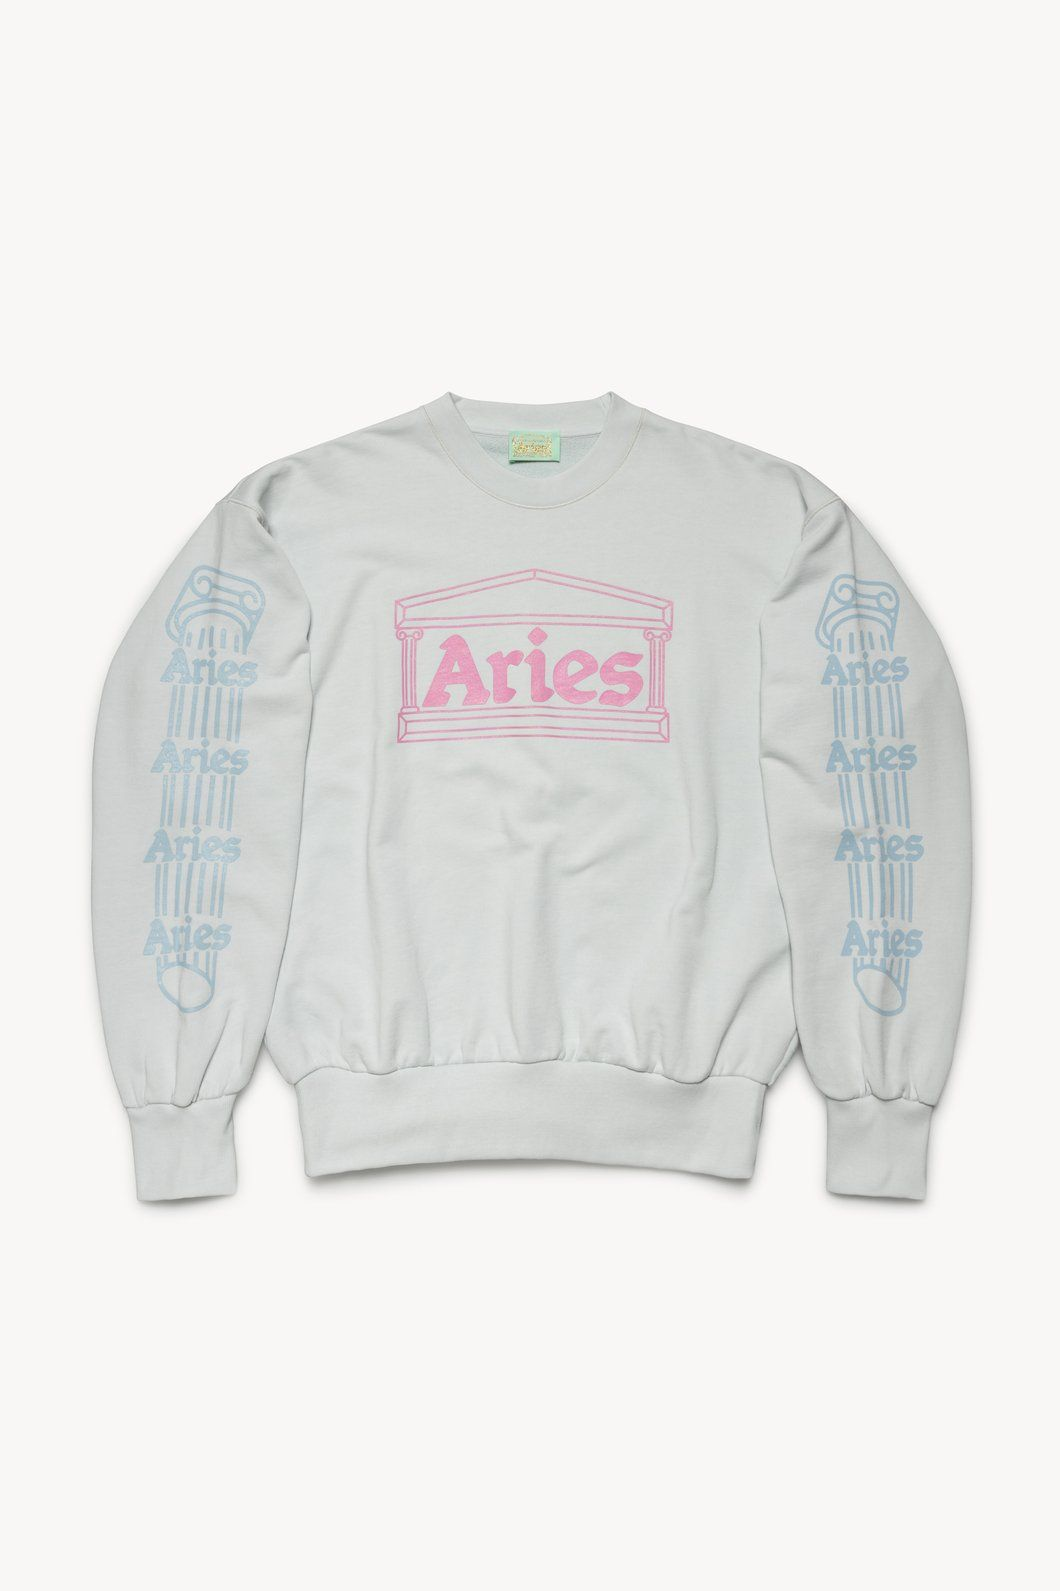 Pin By A K On Fall Winter Style Sweatshirts Sweatshirts Sale Hoodies For Sale [ 1591 x 1060 Pixel ]